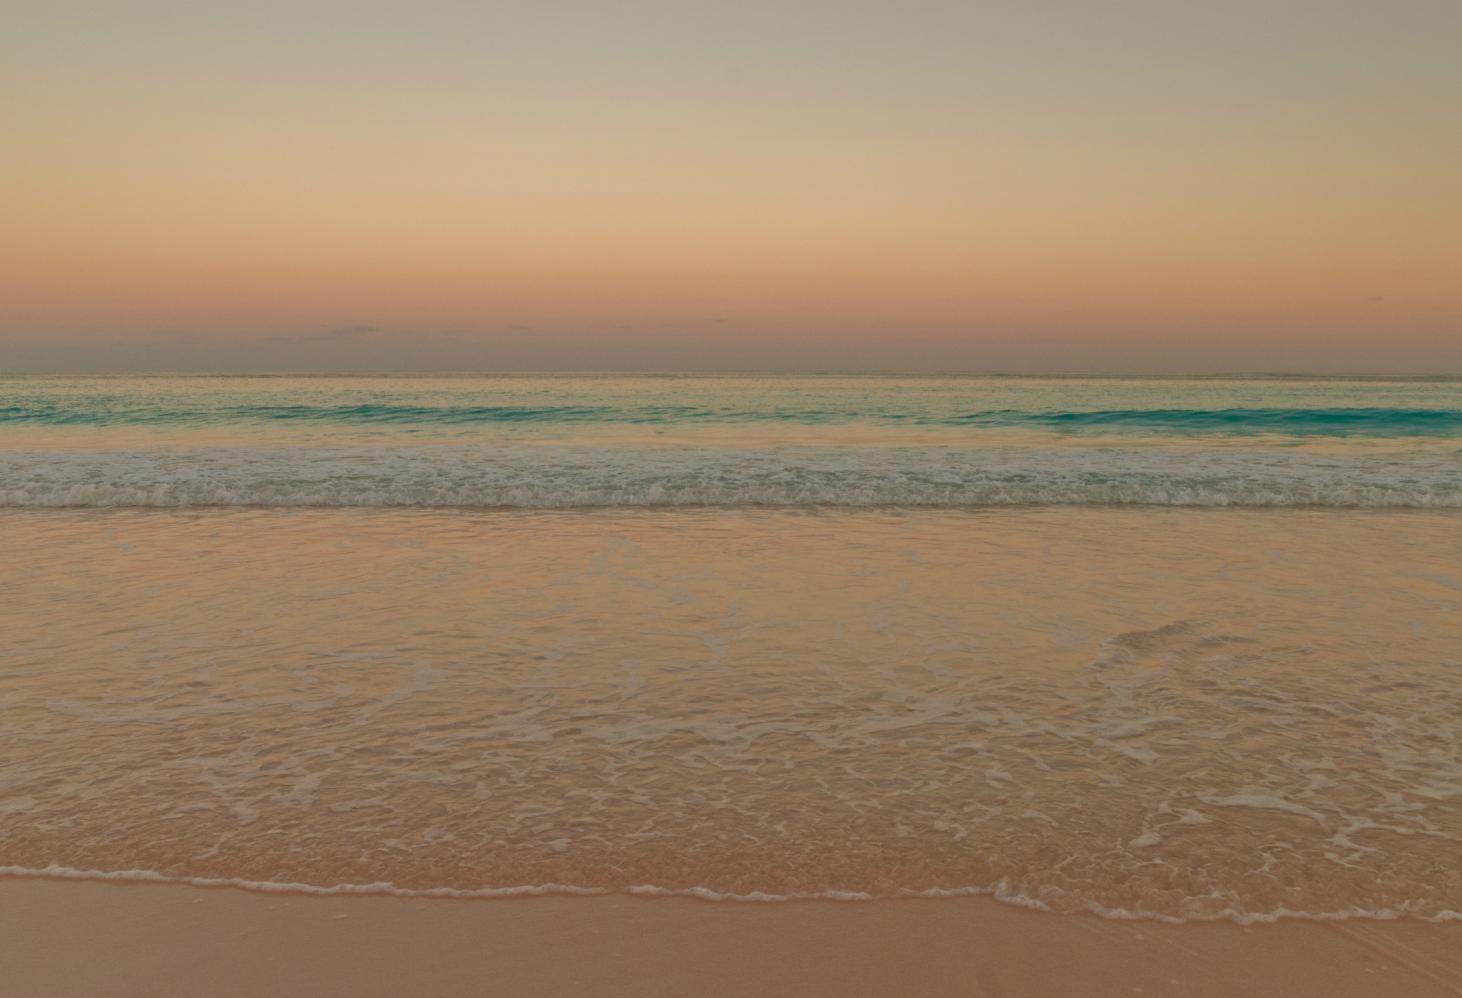 Розовый пляж, о. Харбор, Багамы